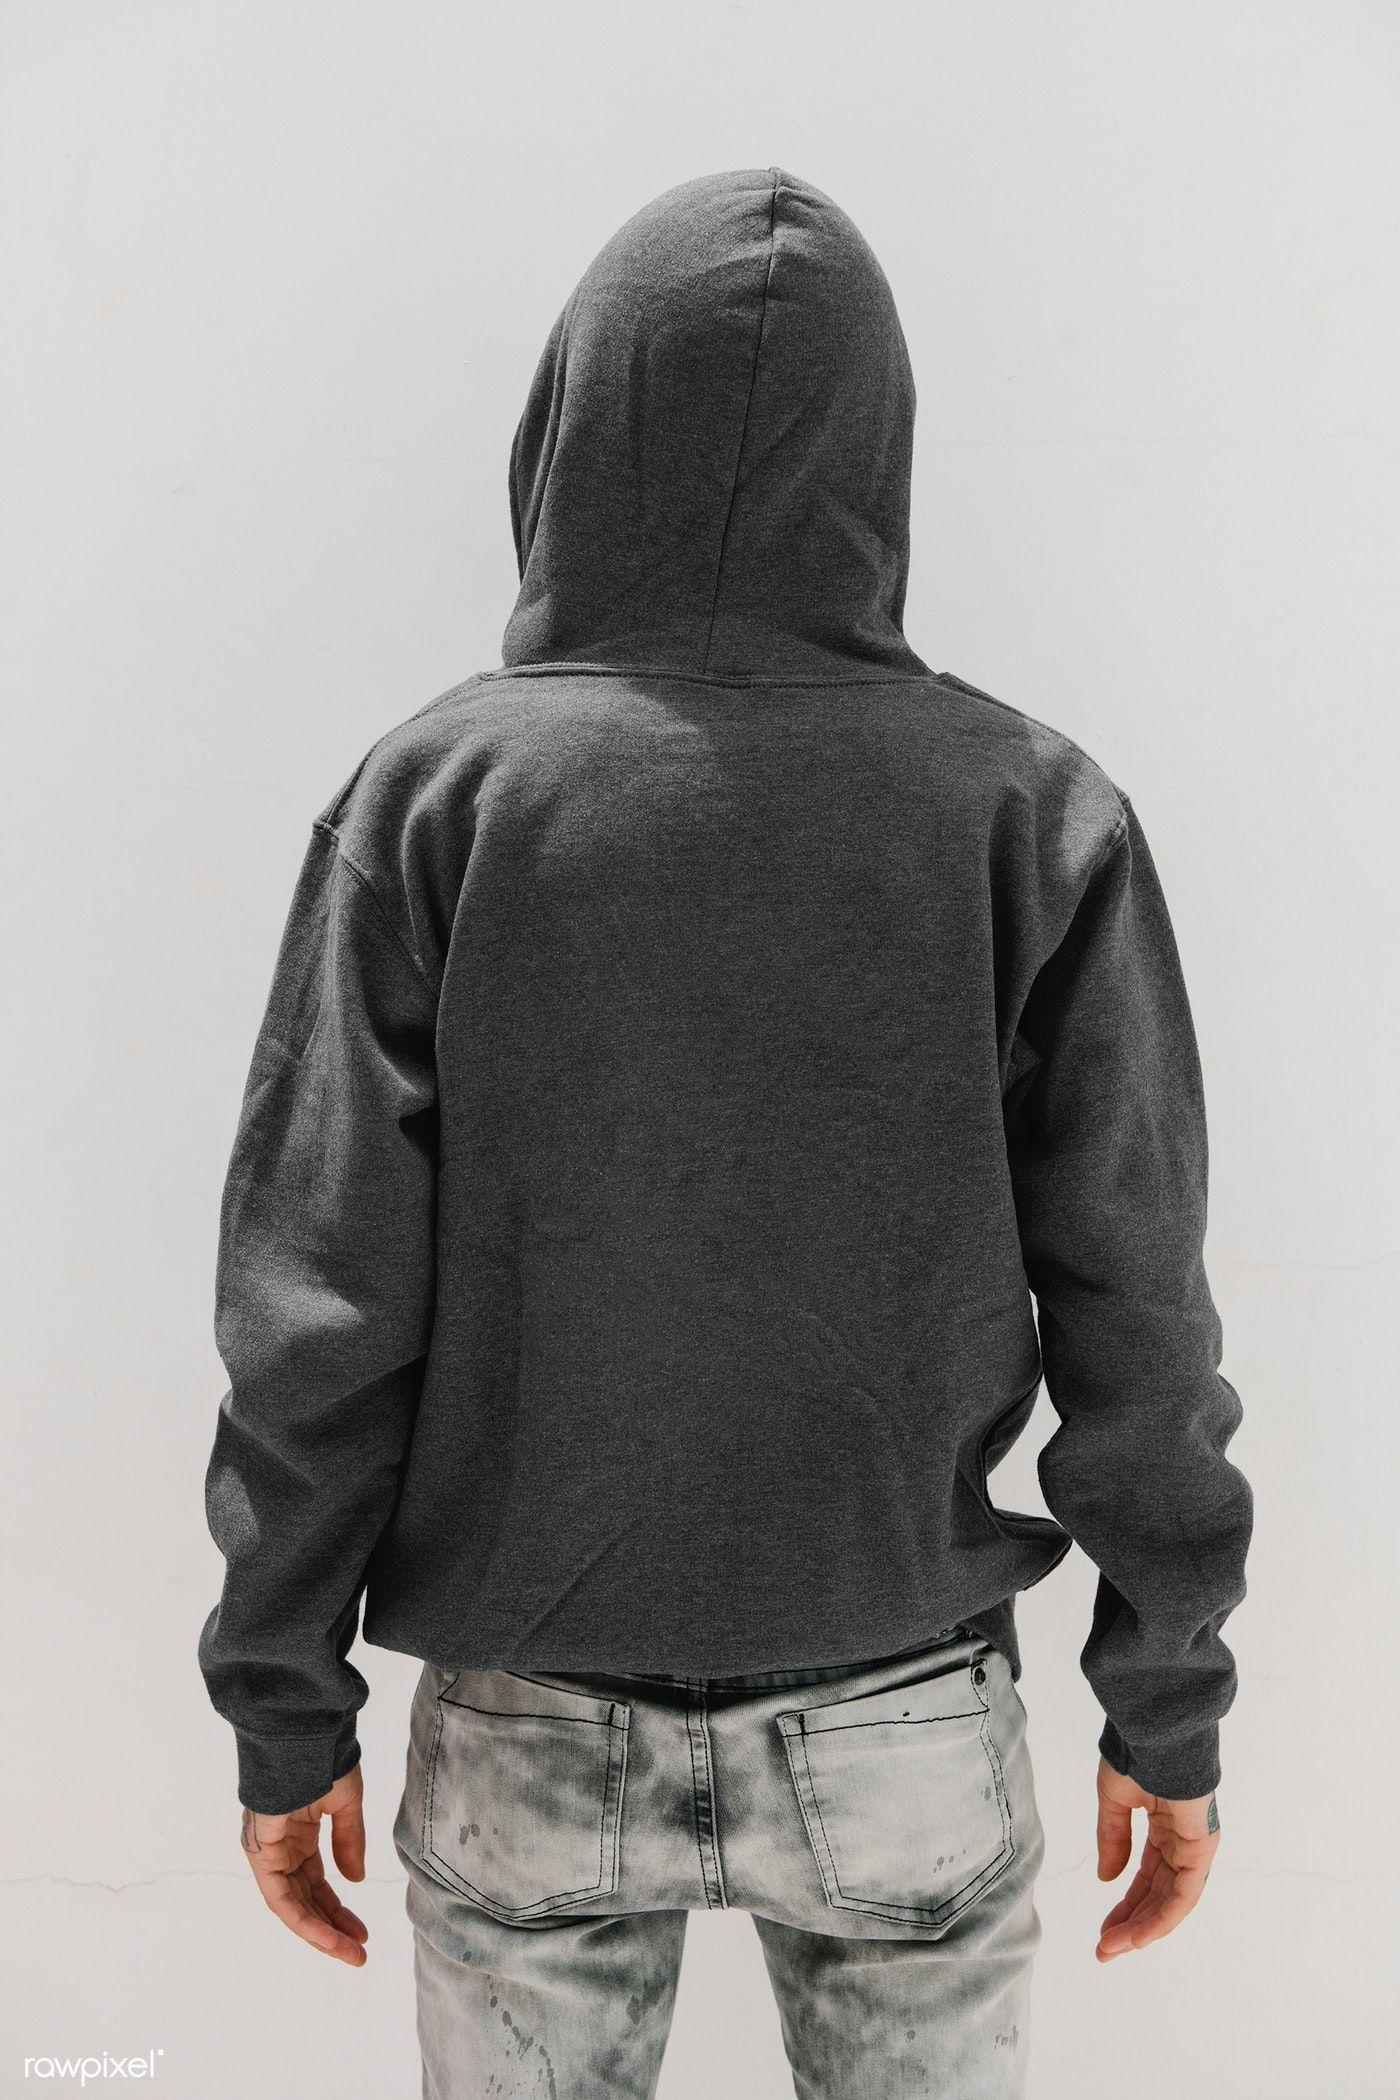 Download Download Premium Psd Of Cool Girl Wearing A Gray Hoodie Mockup 1215246 Hoodie Mockup Hoodie Mockup Free Hoodies